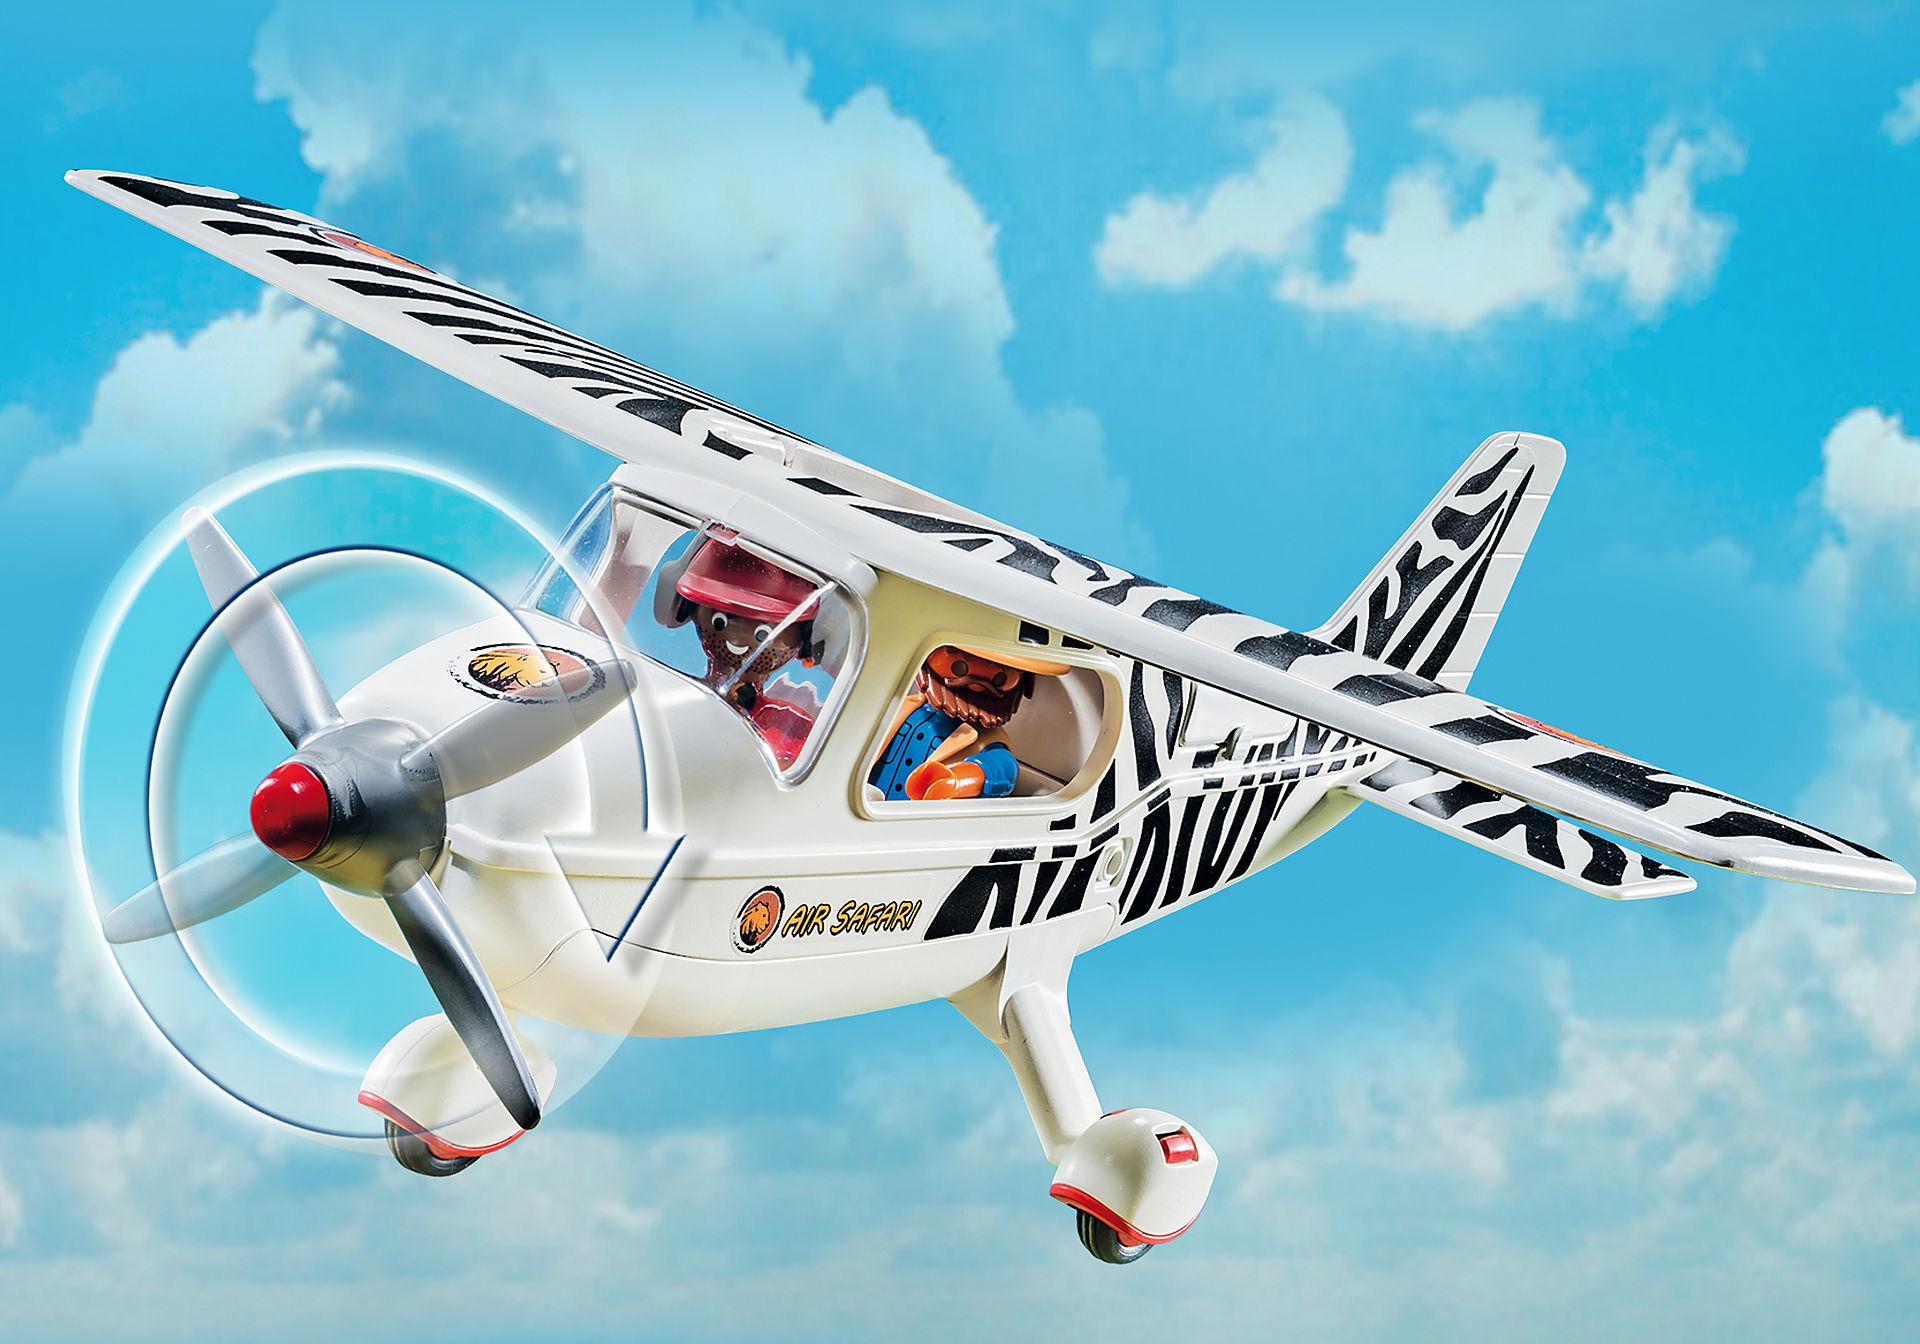 http://media.playmobil.com/i/playmobil/6938_product_extra2/Avioneta de safari